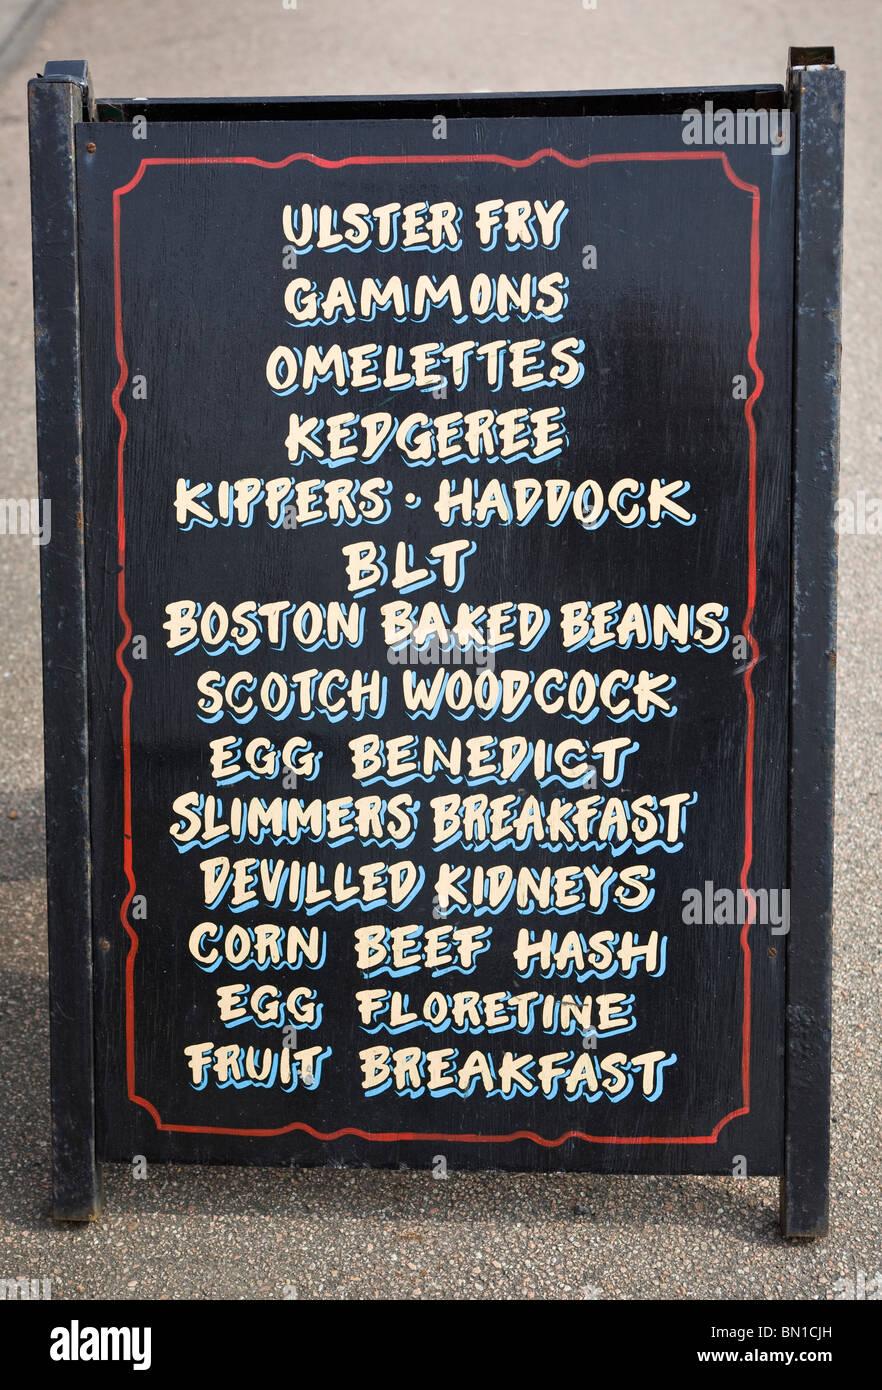 Cafe Menu Board Deal Kent UK - Stock Image